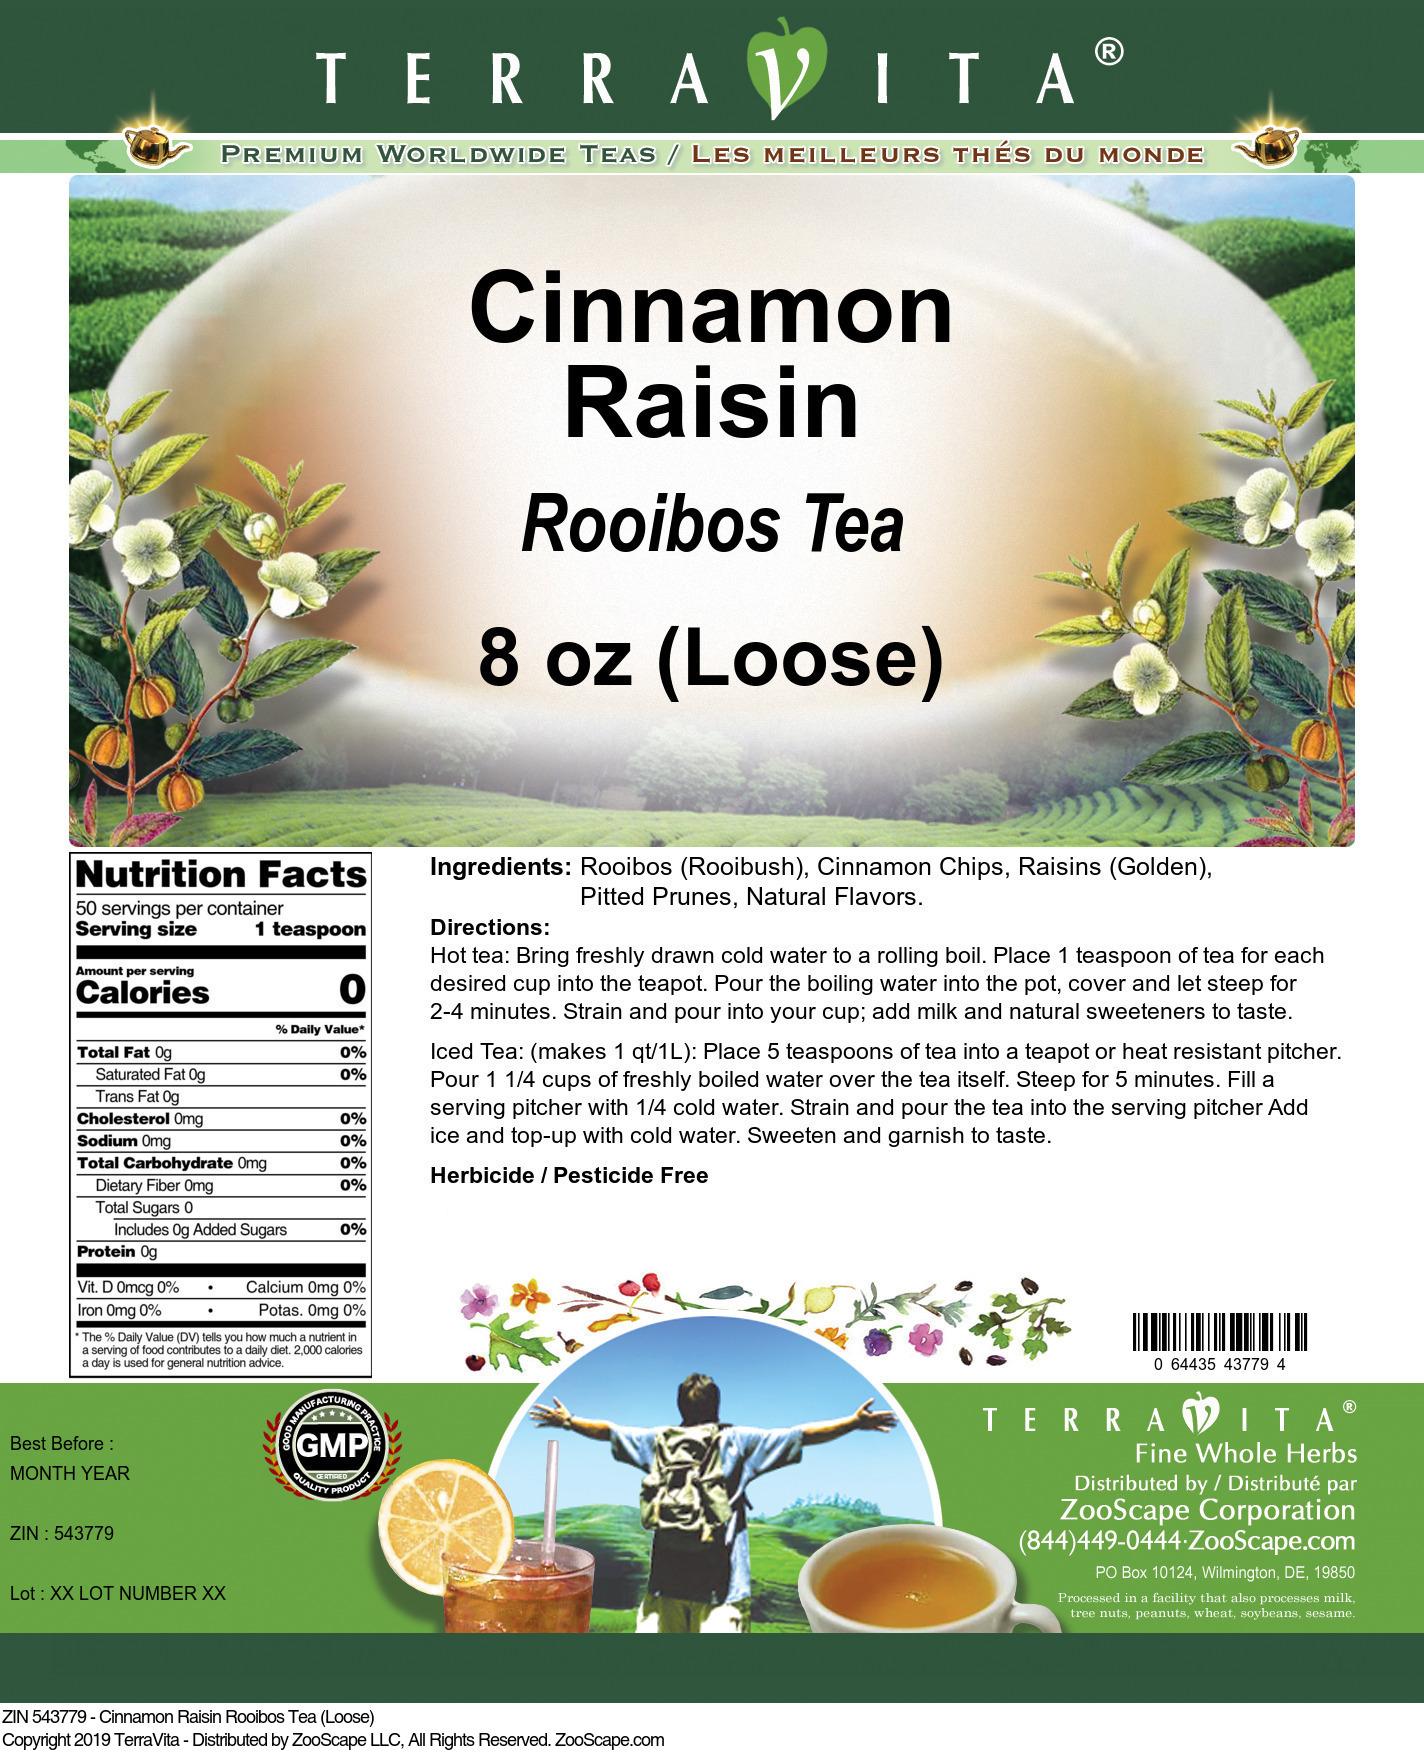 Cinnamon Raisin Rooibos Tea (Loose)